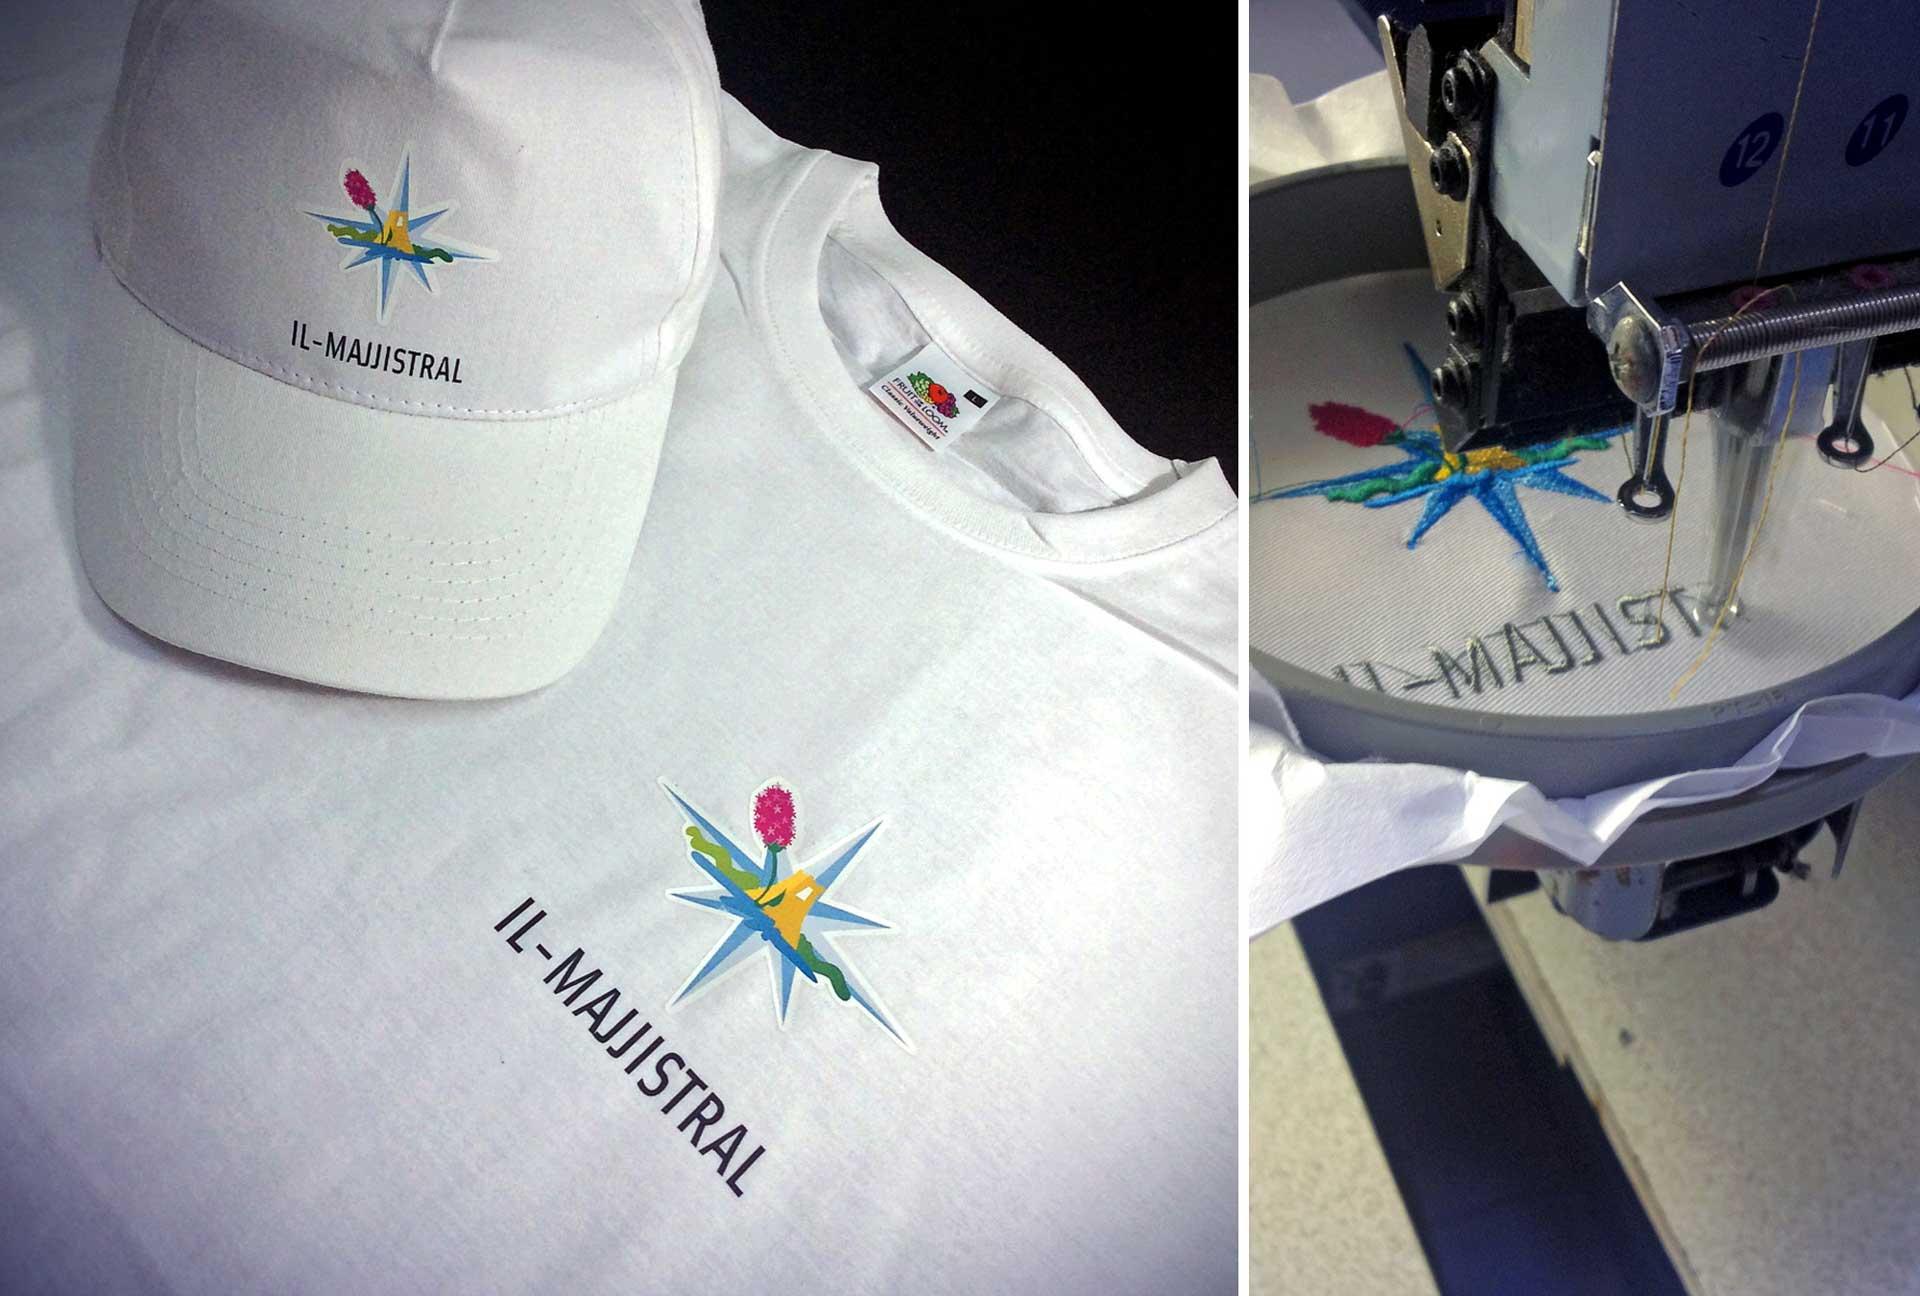 Uniform & Kits - Il Majjistral Tshirt & Cap